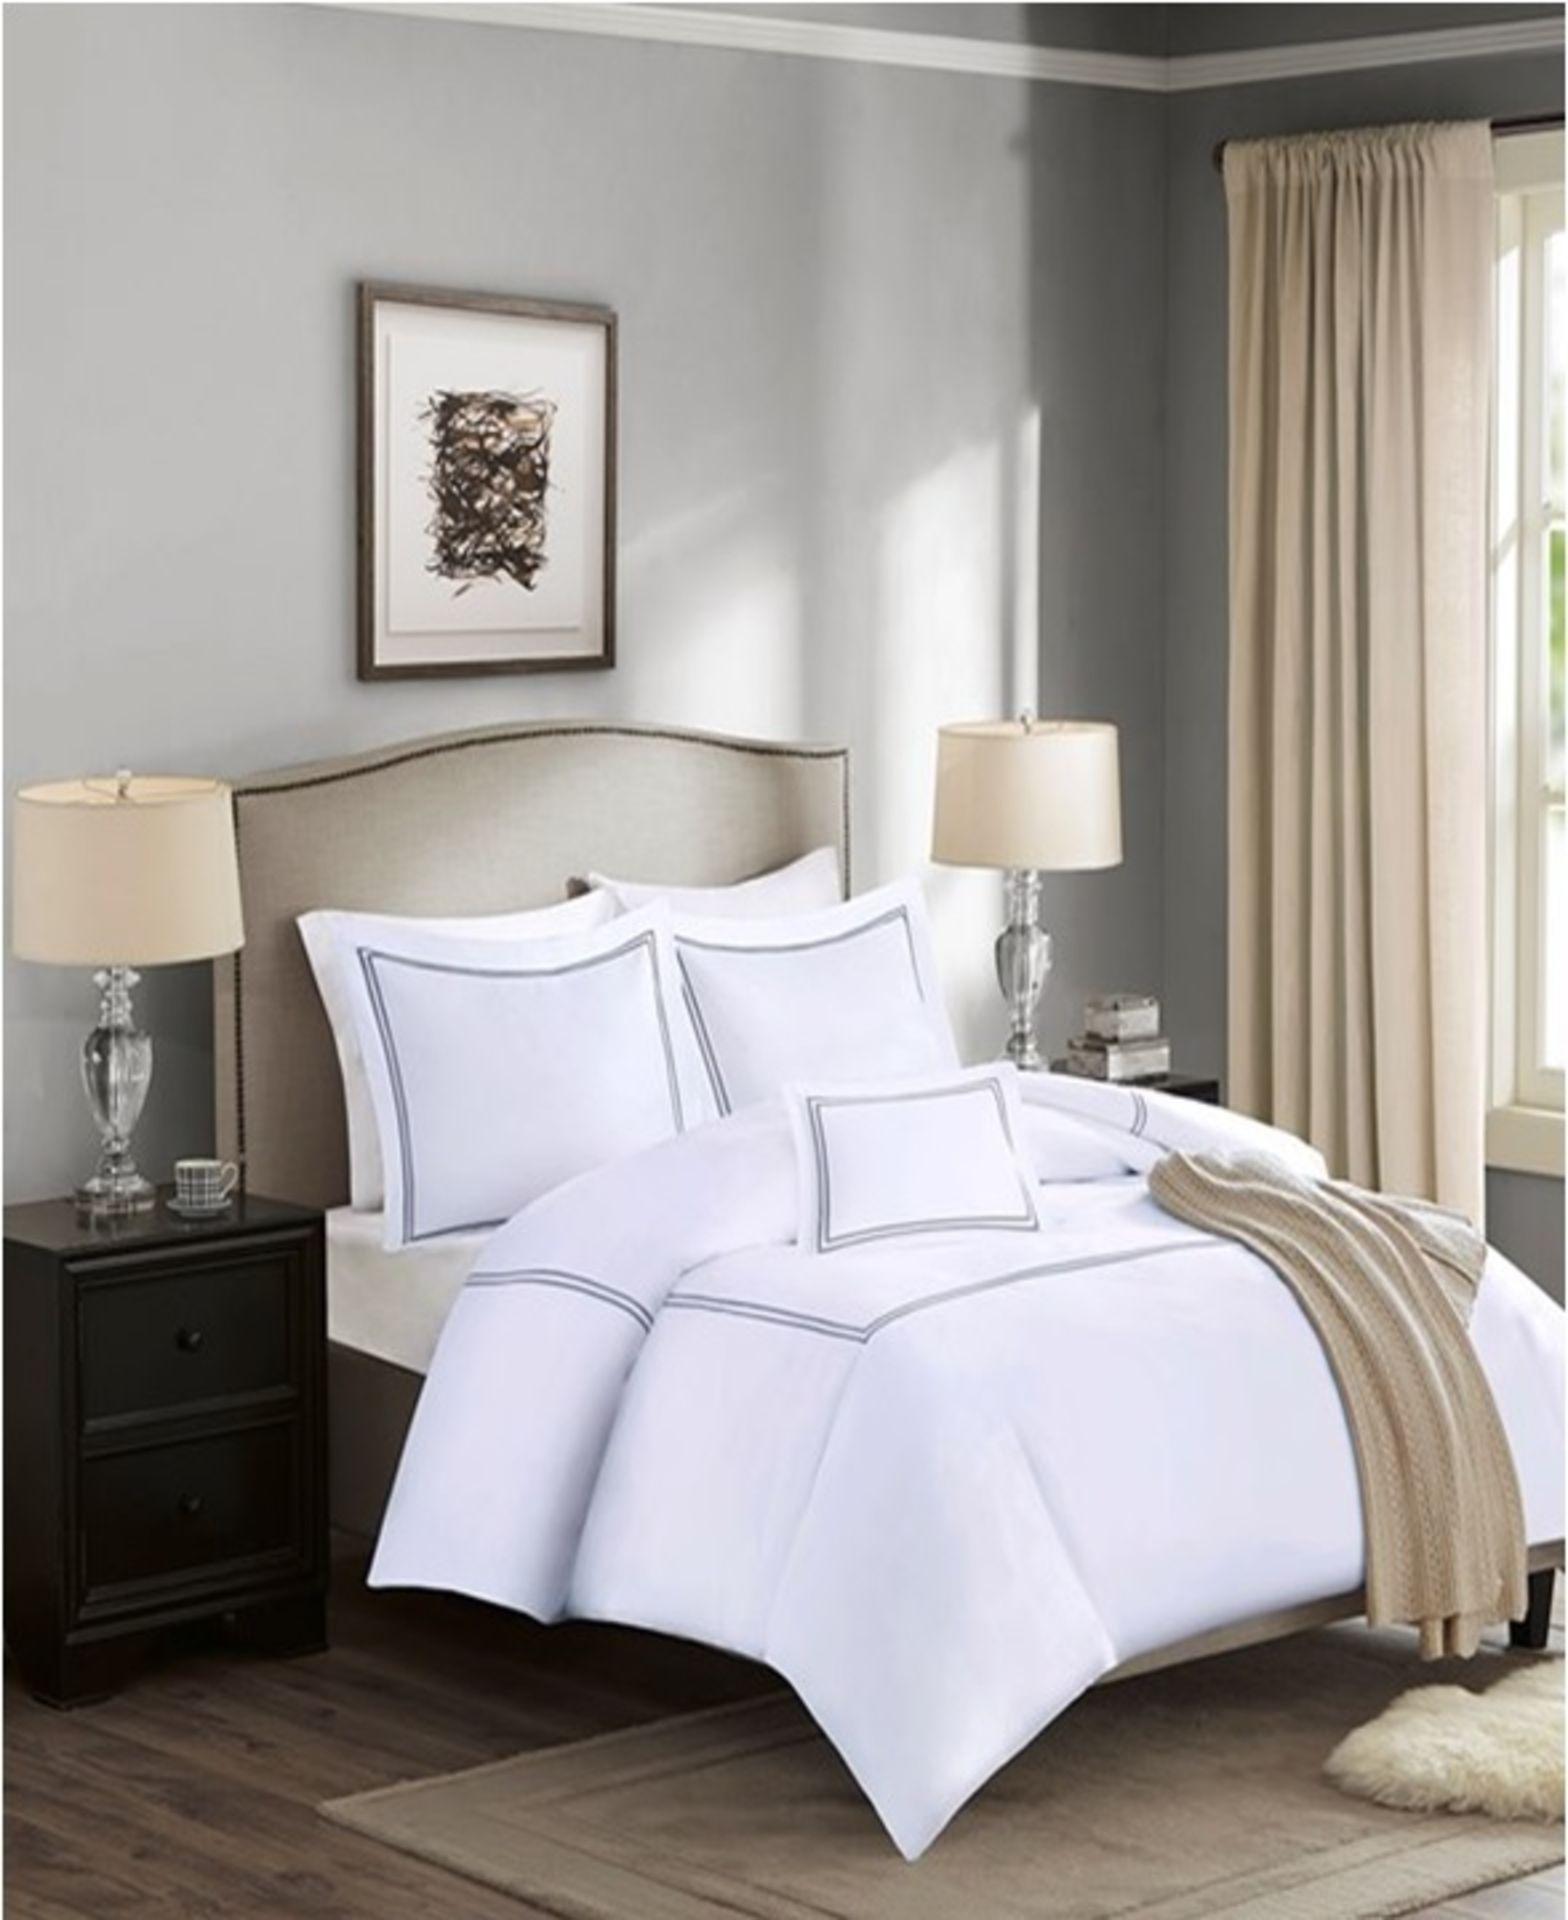 Lot 139 - 1 x Madison Park Luxury Collection Single Duvet Set White - Product Code MP12-0197UK (Brand New -